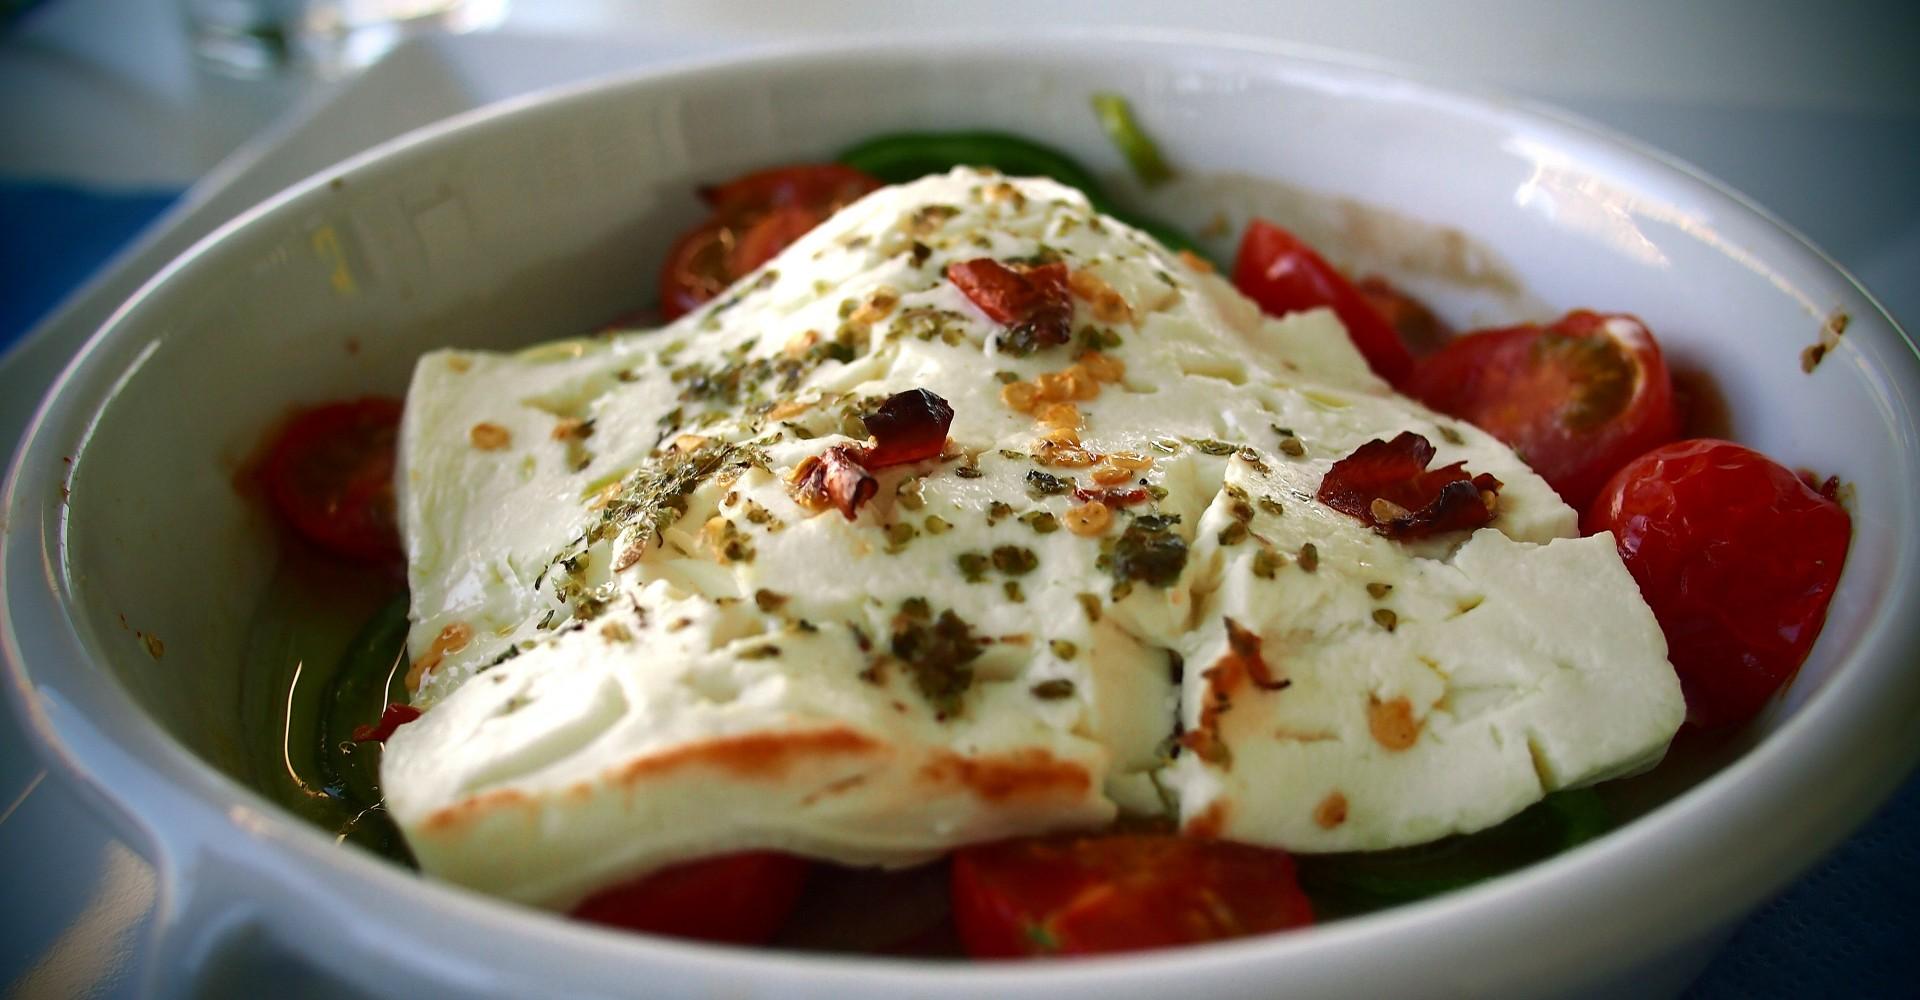 Spicy Baked Feta Recipe From Greece